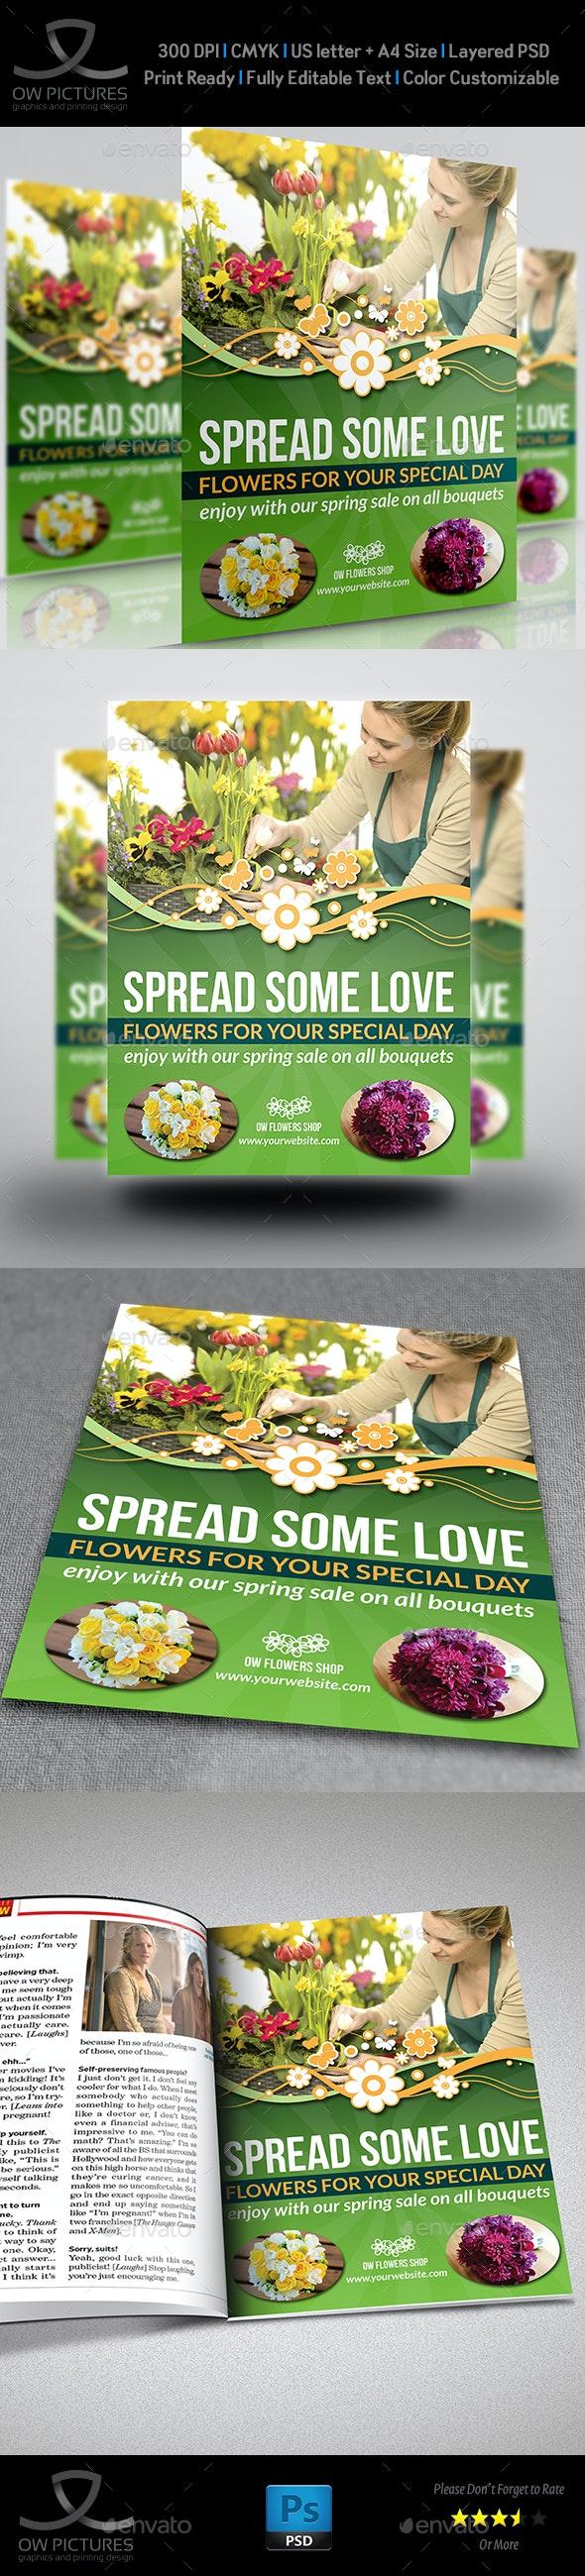 Flowers Shop Flyer Template - Commerce Flyers